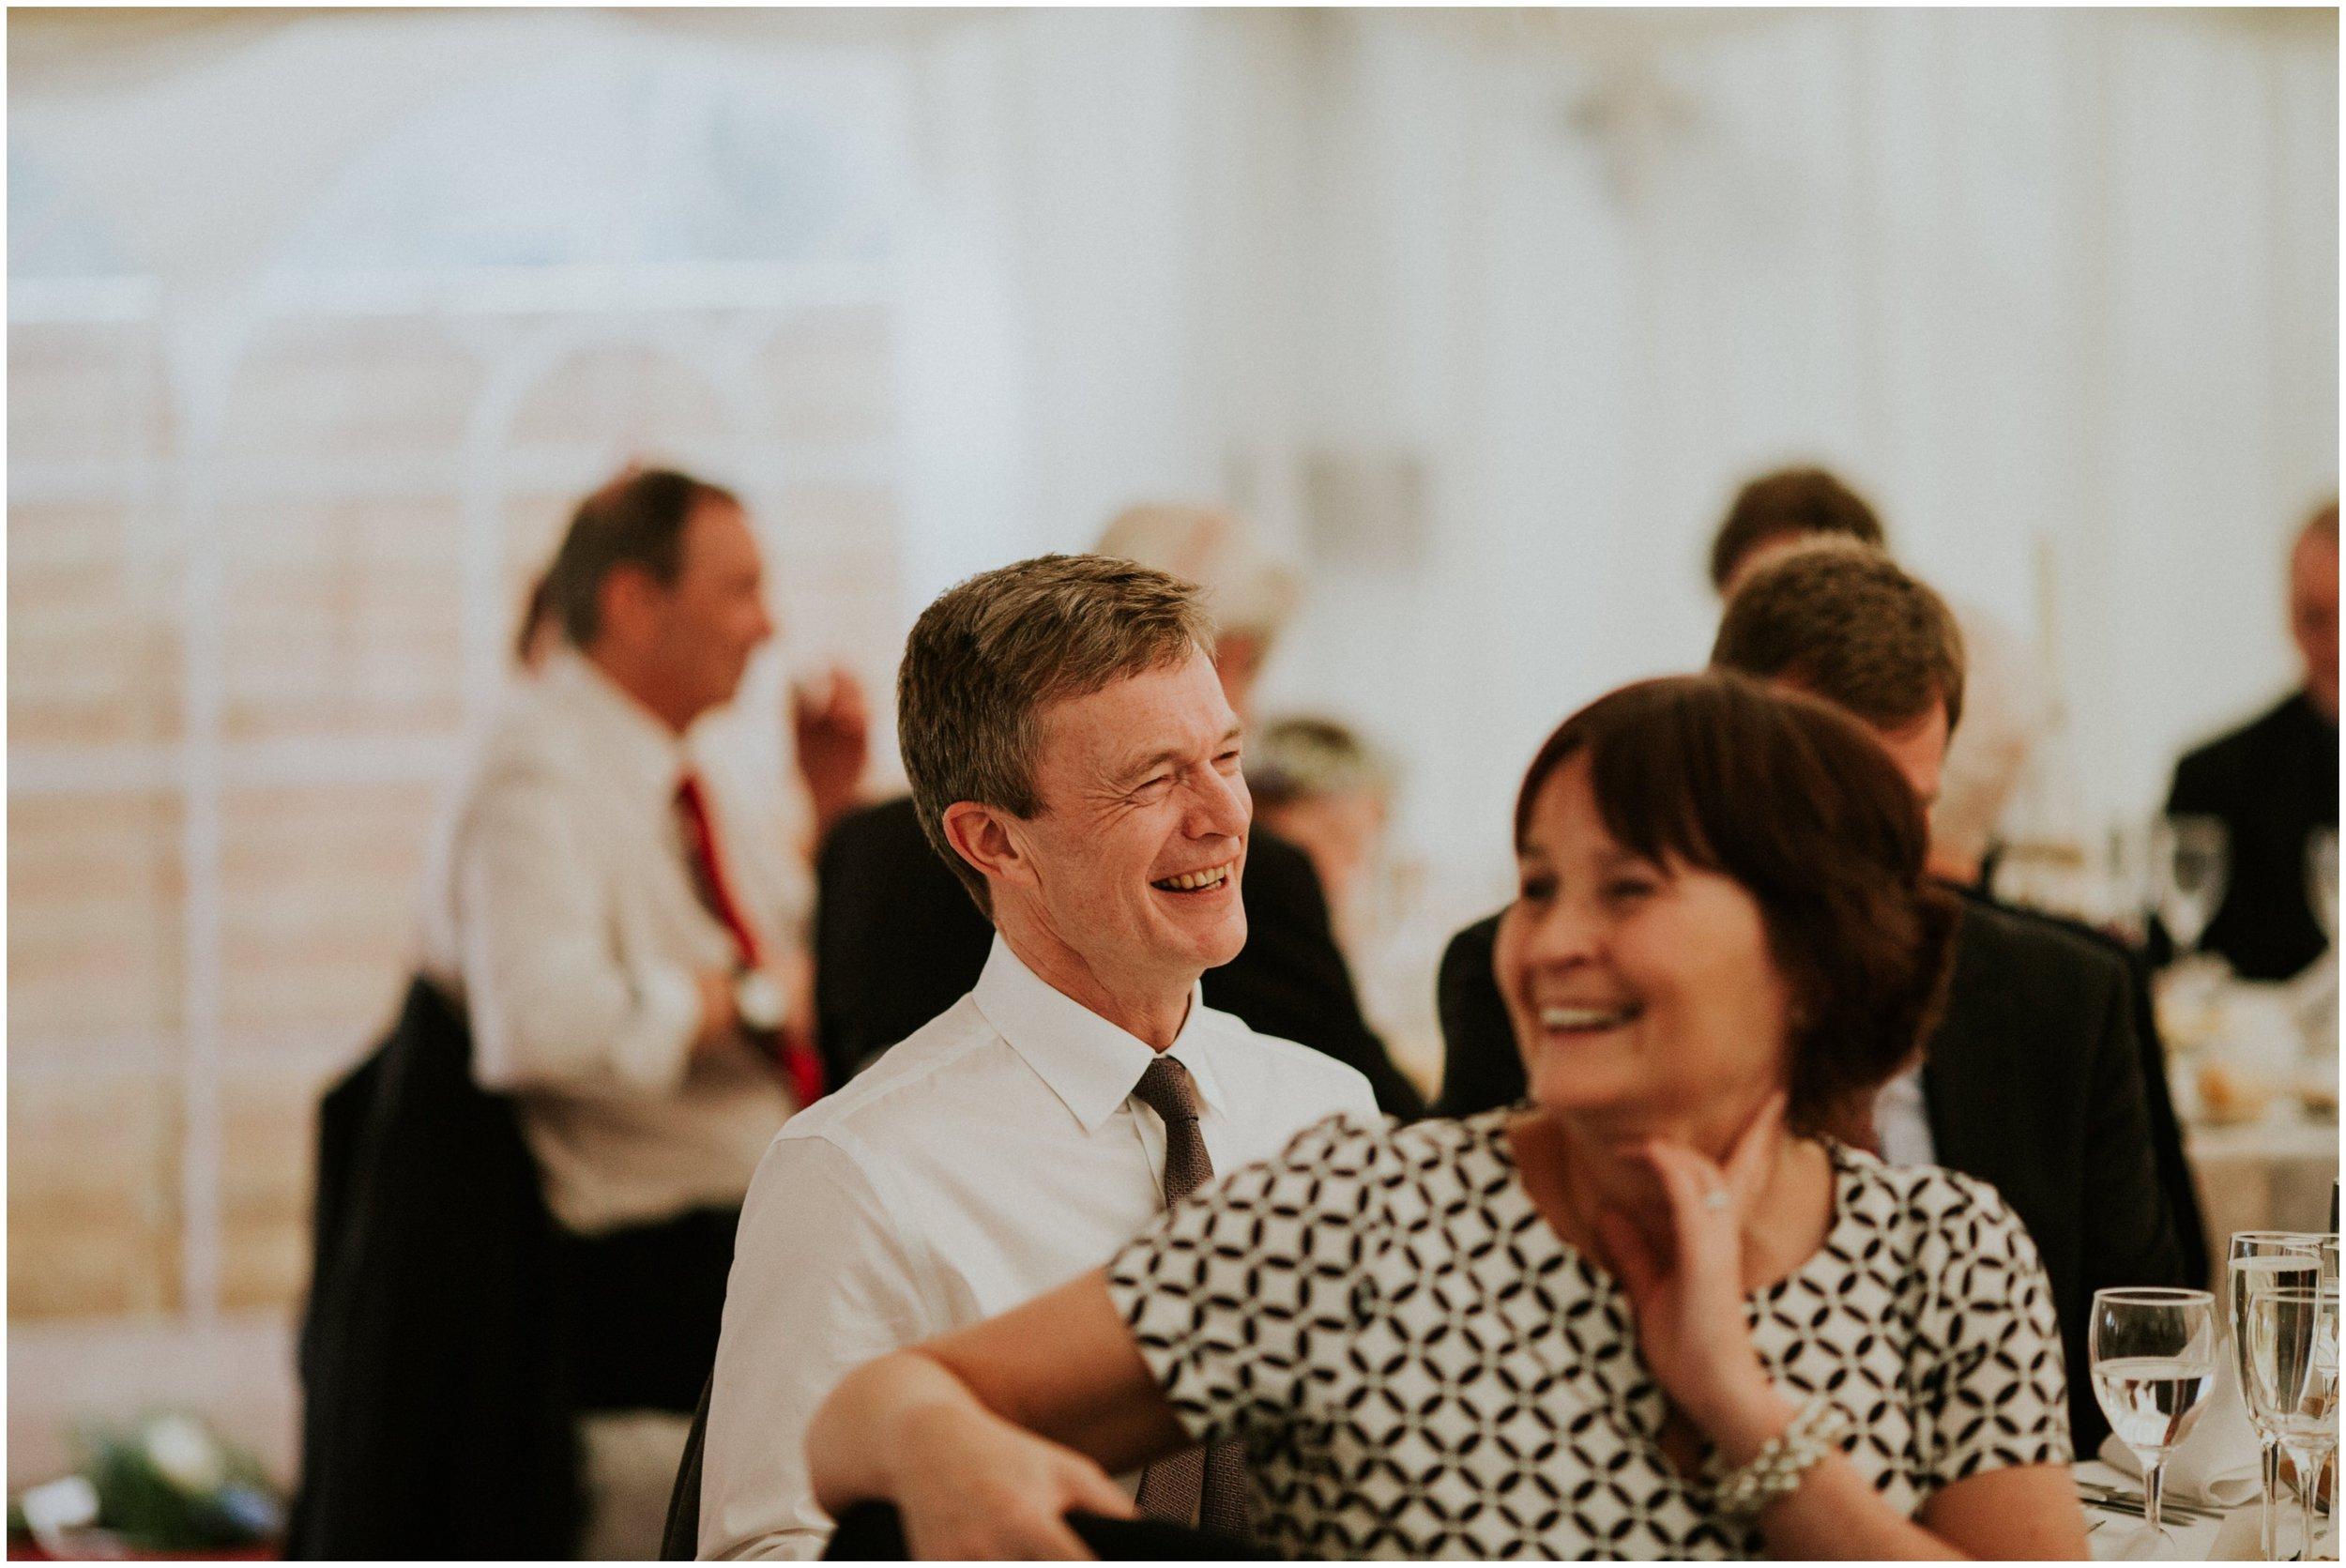 Photography 78 - Glasgow Wedding Photographer - Dave & Alana_0083.jpg